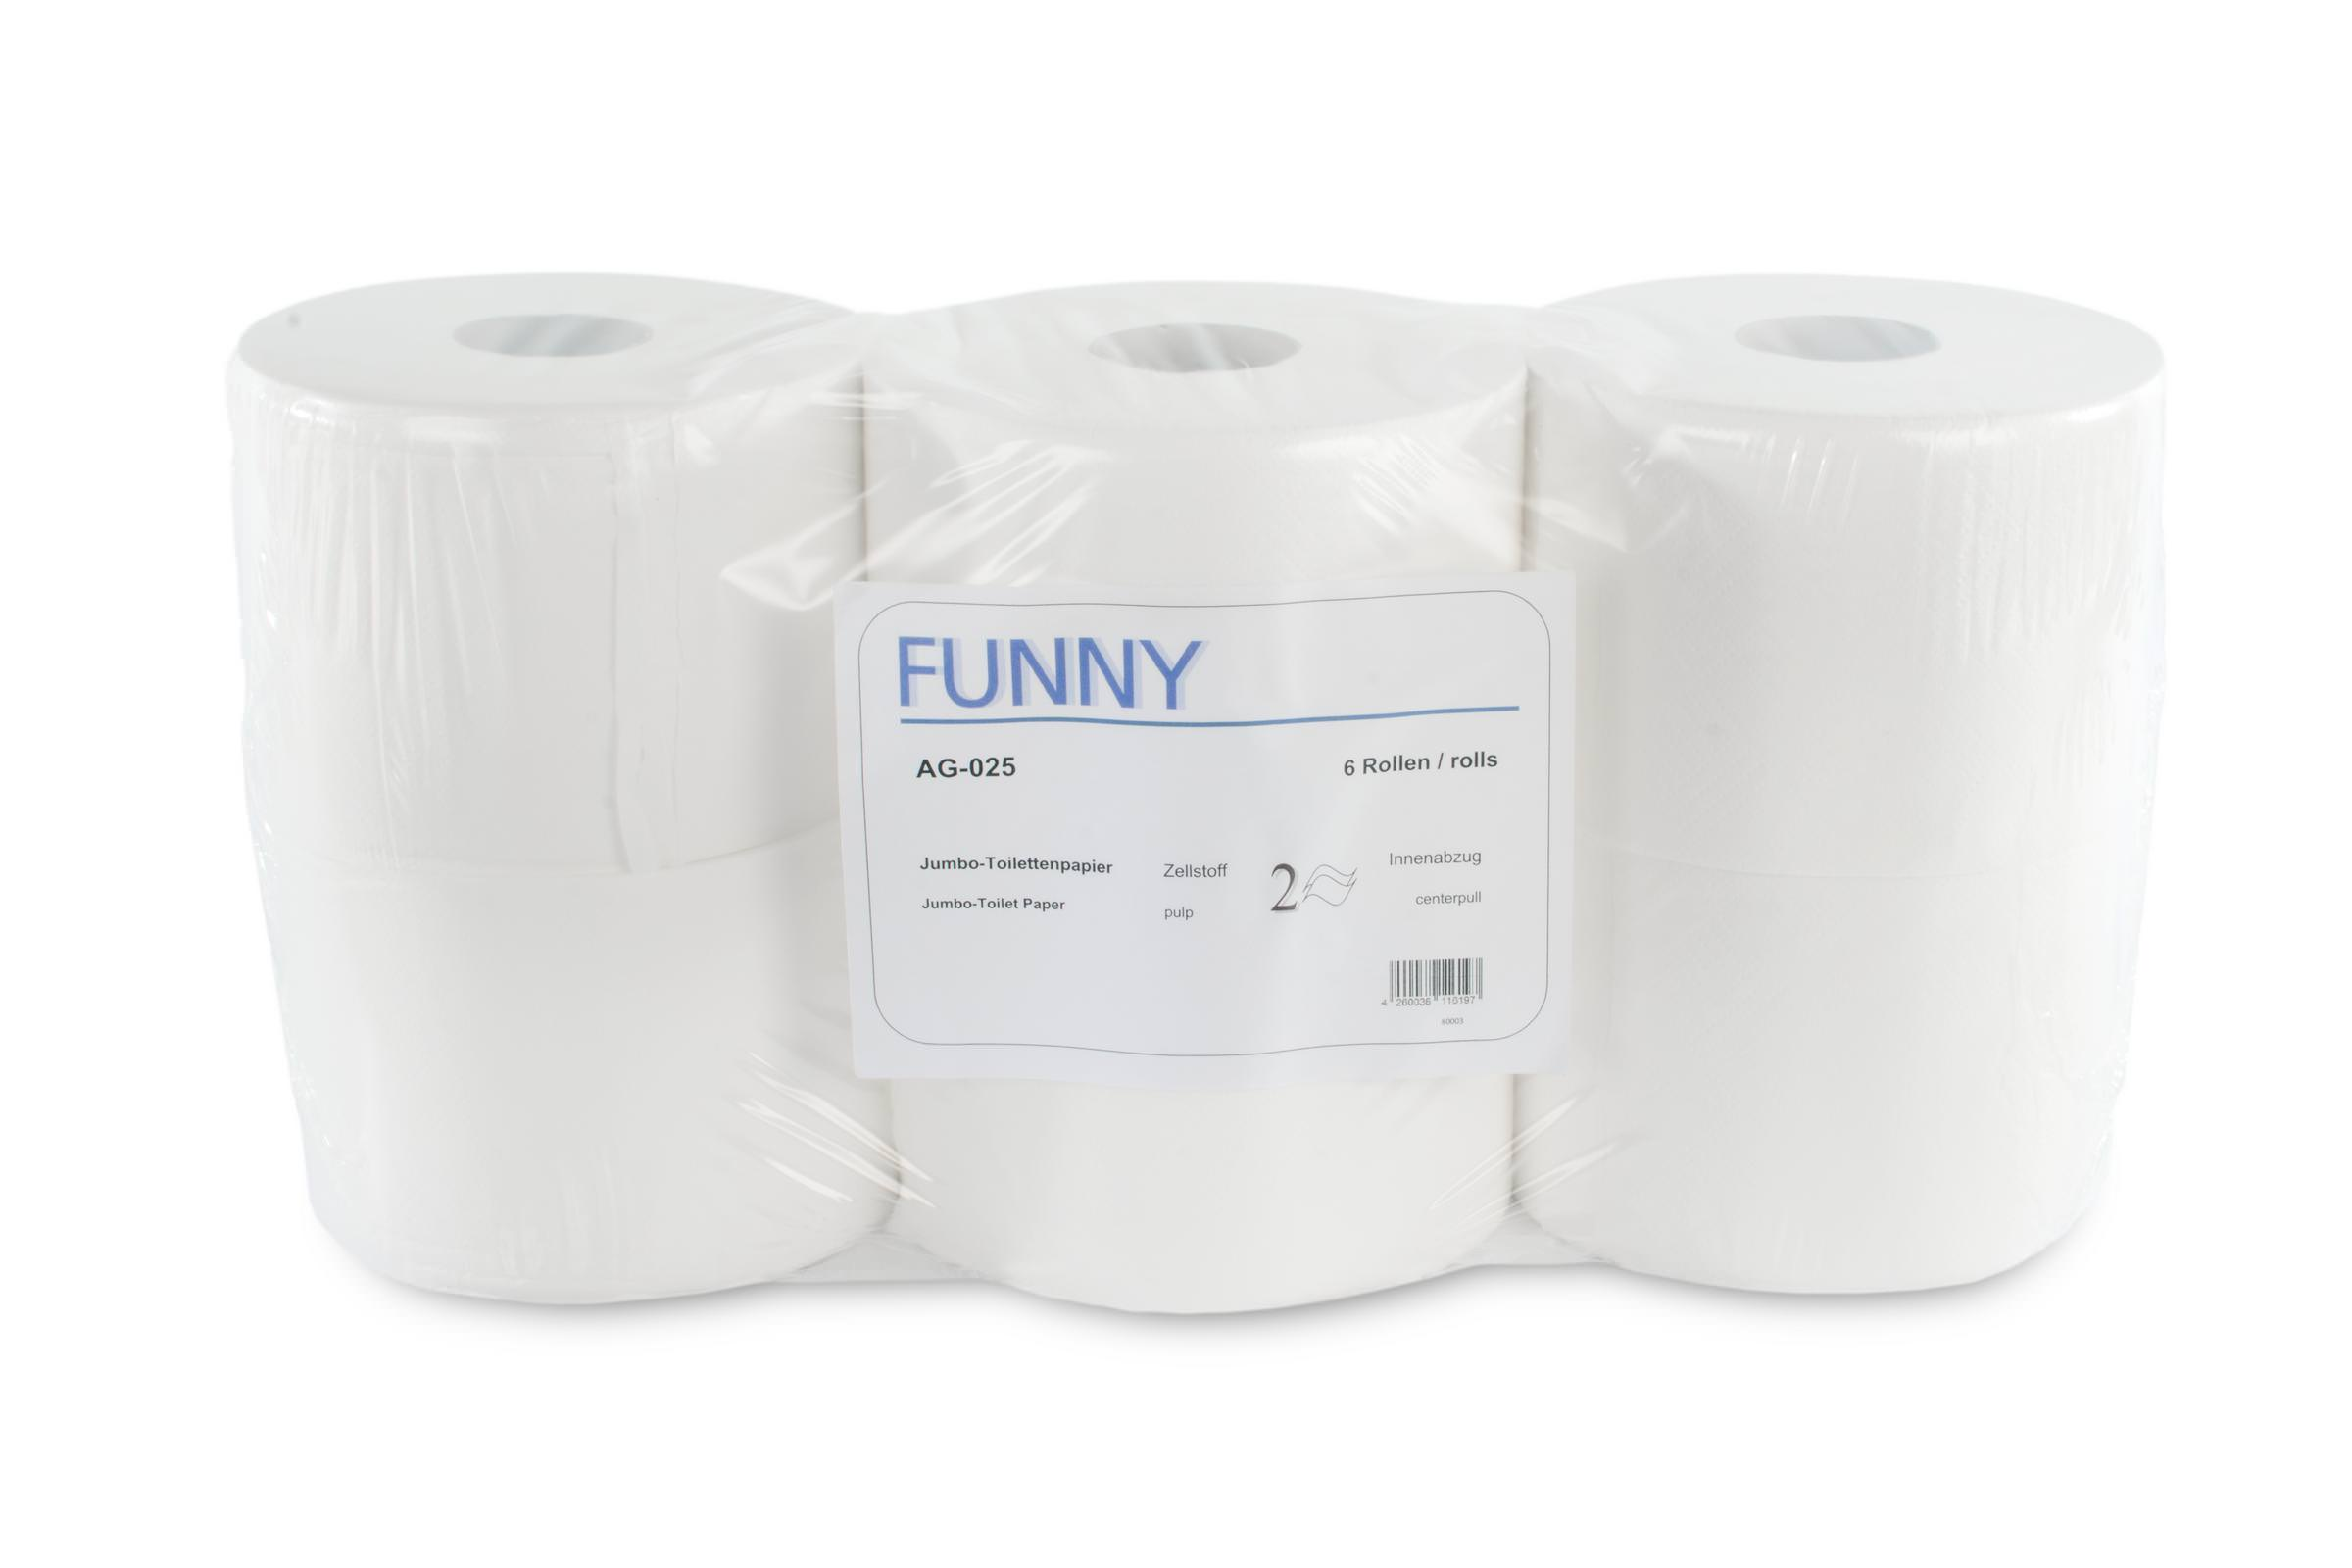 Klopapier Toilettenpapier Motiv Angela Merkel Bundeskanzlerin 2 Rollen